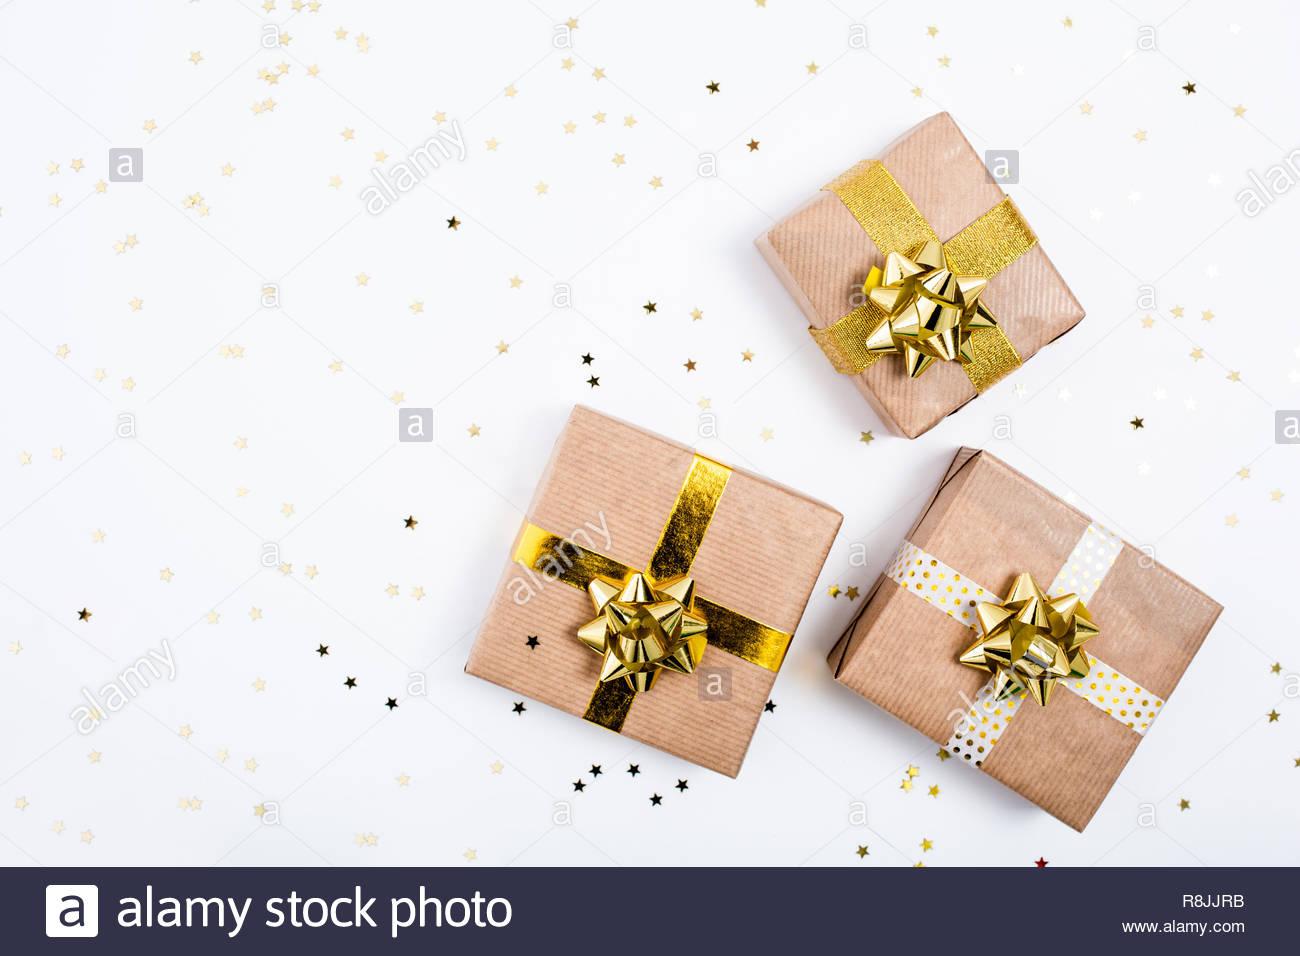 Selbstgemachte Geschenke Selbstgemachte Geschenke Fur Beste